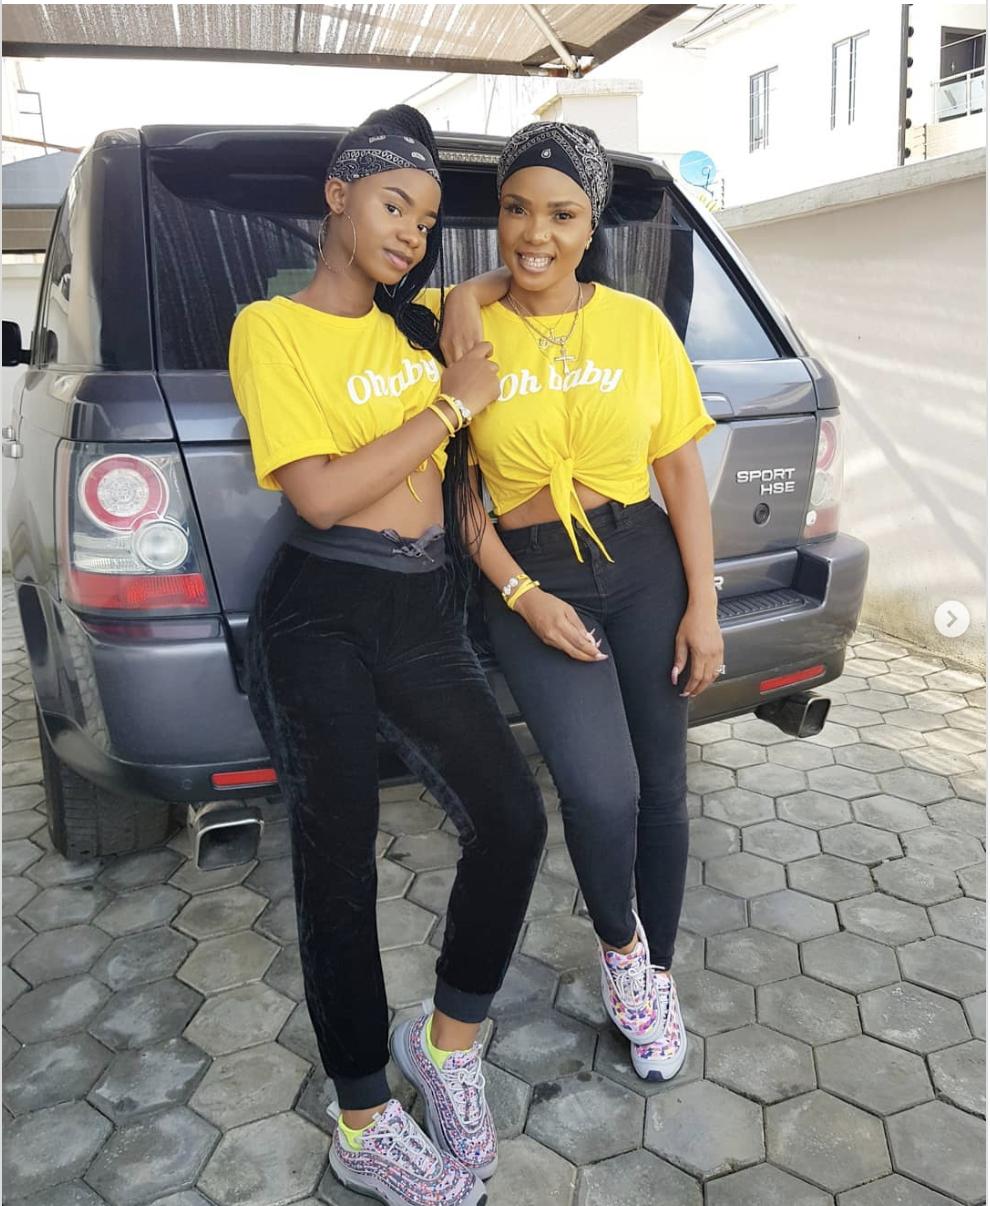 Real reasons Iyabo Ojo, Biodun Okeowo, Mercy Aigbe show off their daughters on social mediaReal reasons Iyabo Ojo, Biodun Okeowo, Mercy Aigbe show off their daughters on social media